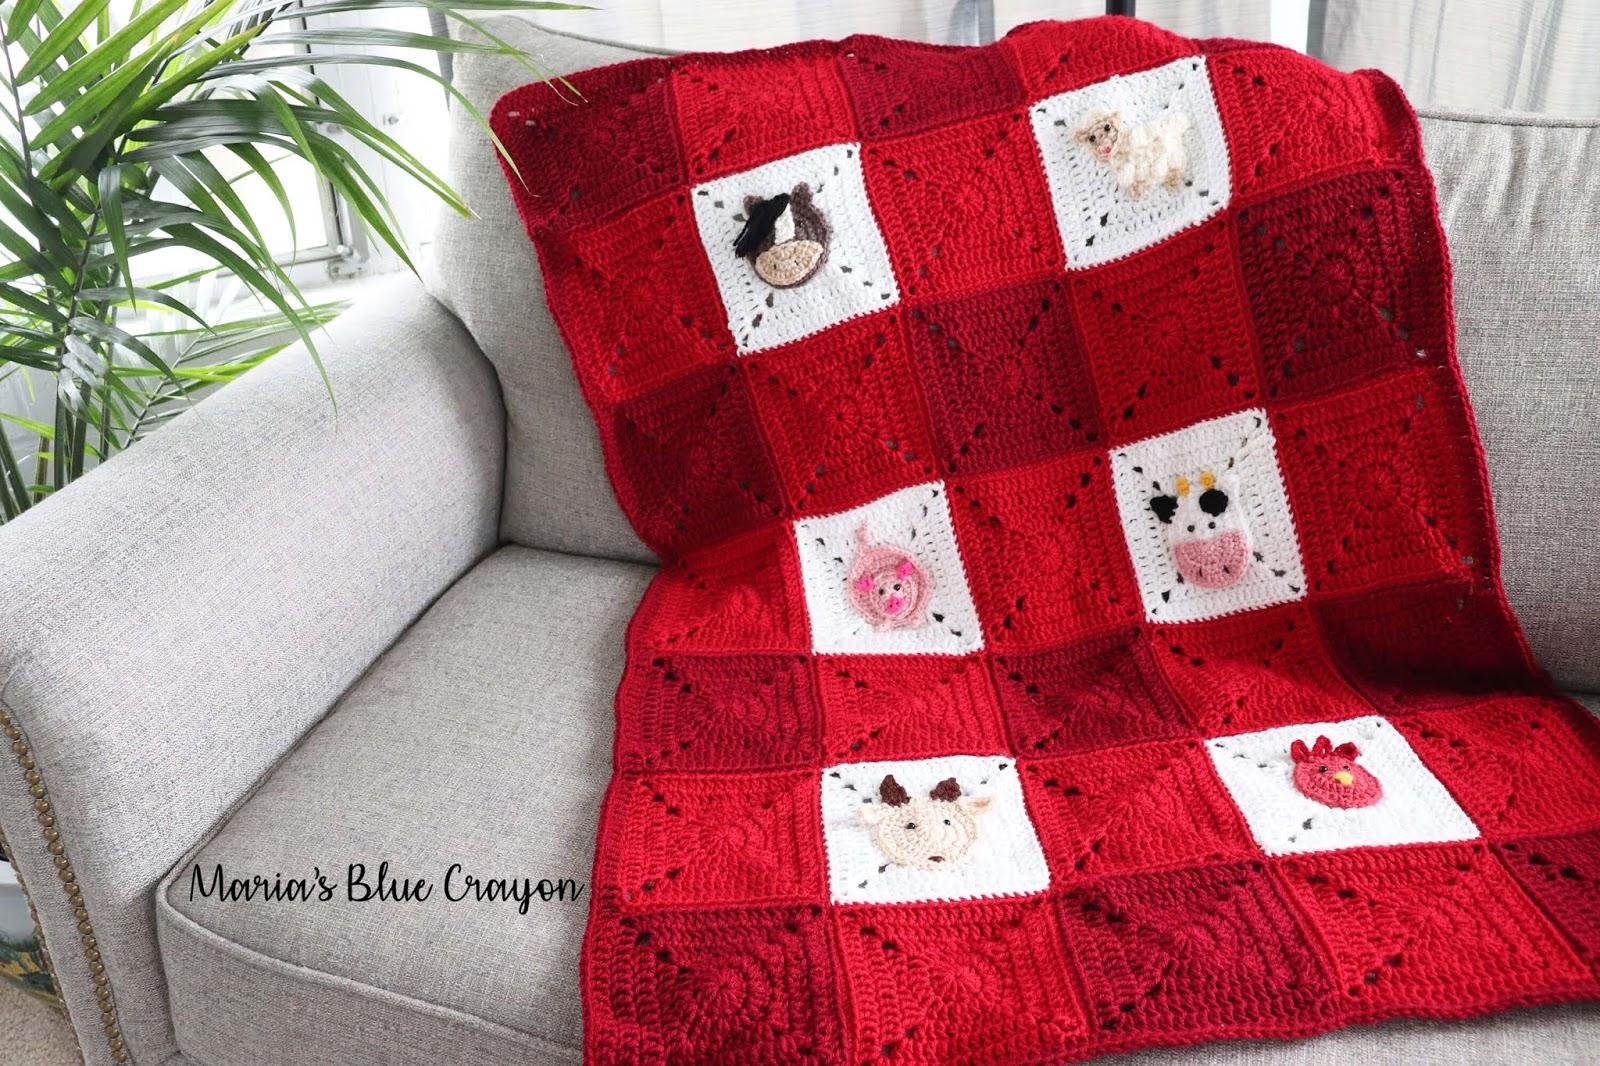 Granny square farm blanket free crochet pattern and crochet along